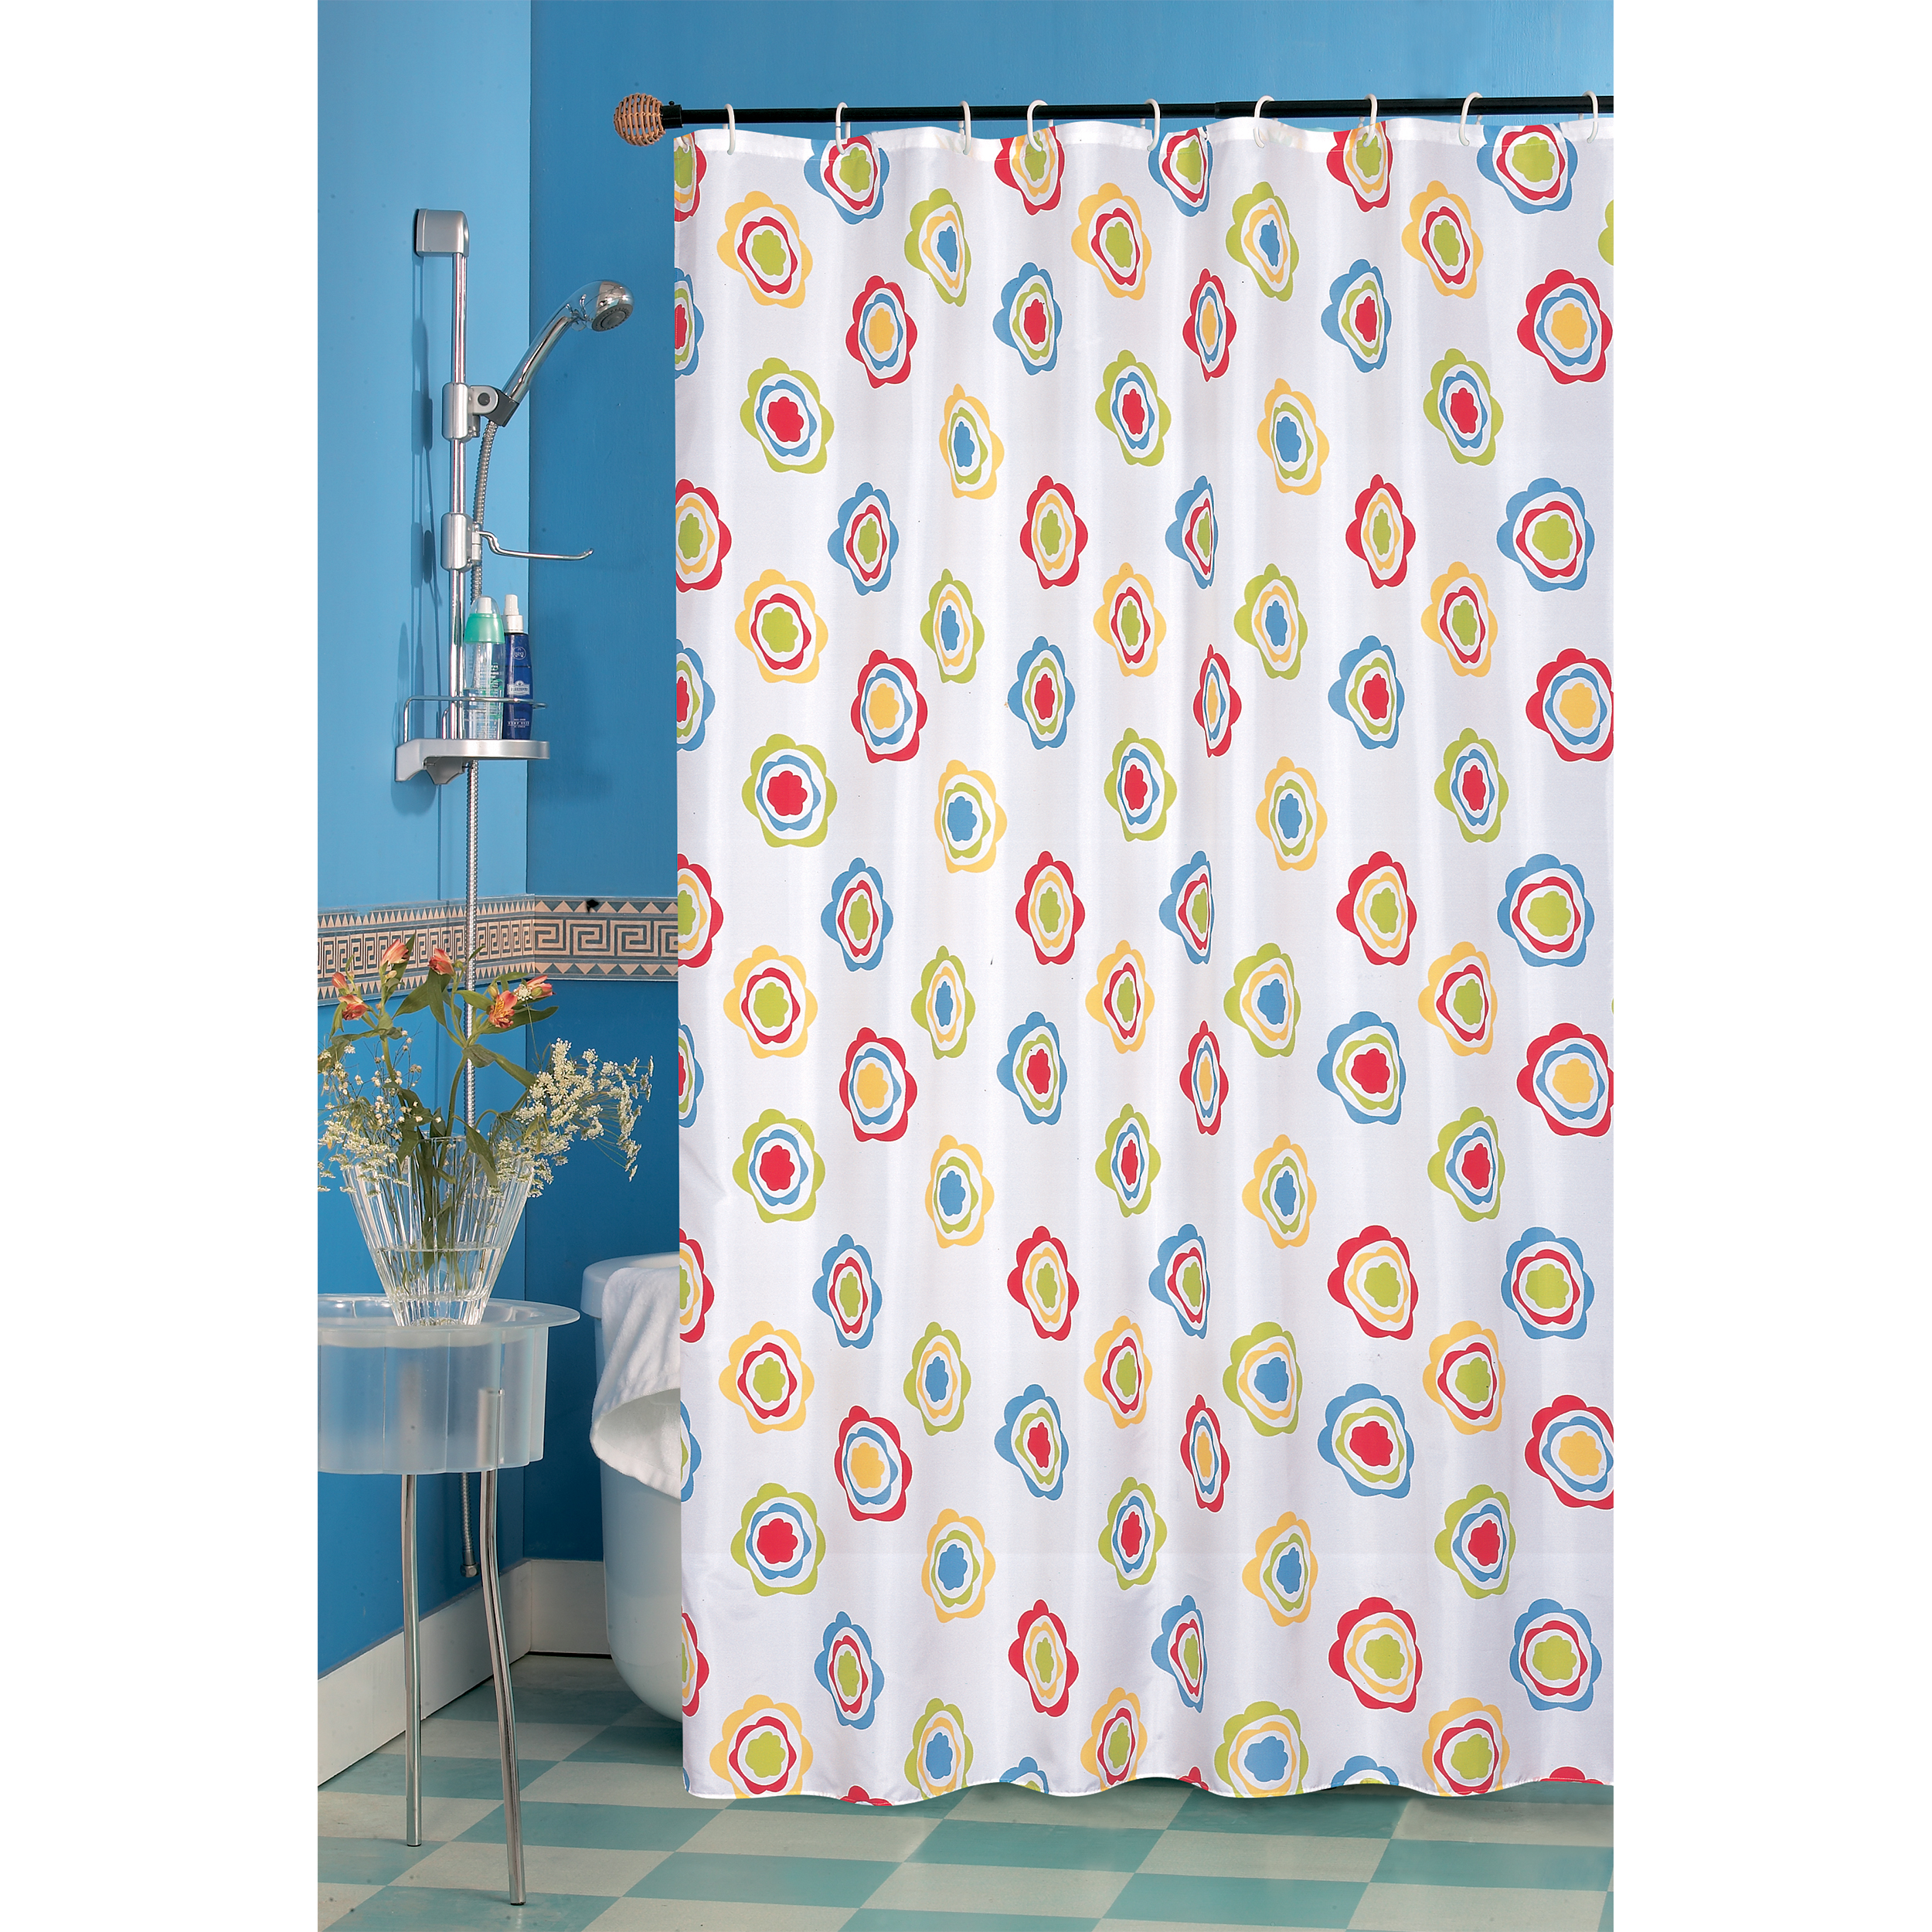 MSV Duschvorhang 180x200cm Anti Schimmel Textil Badewannenvorhang Wannenvorhang Kreise Bunt